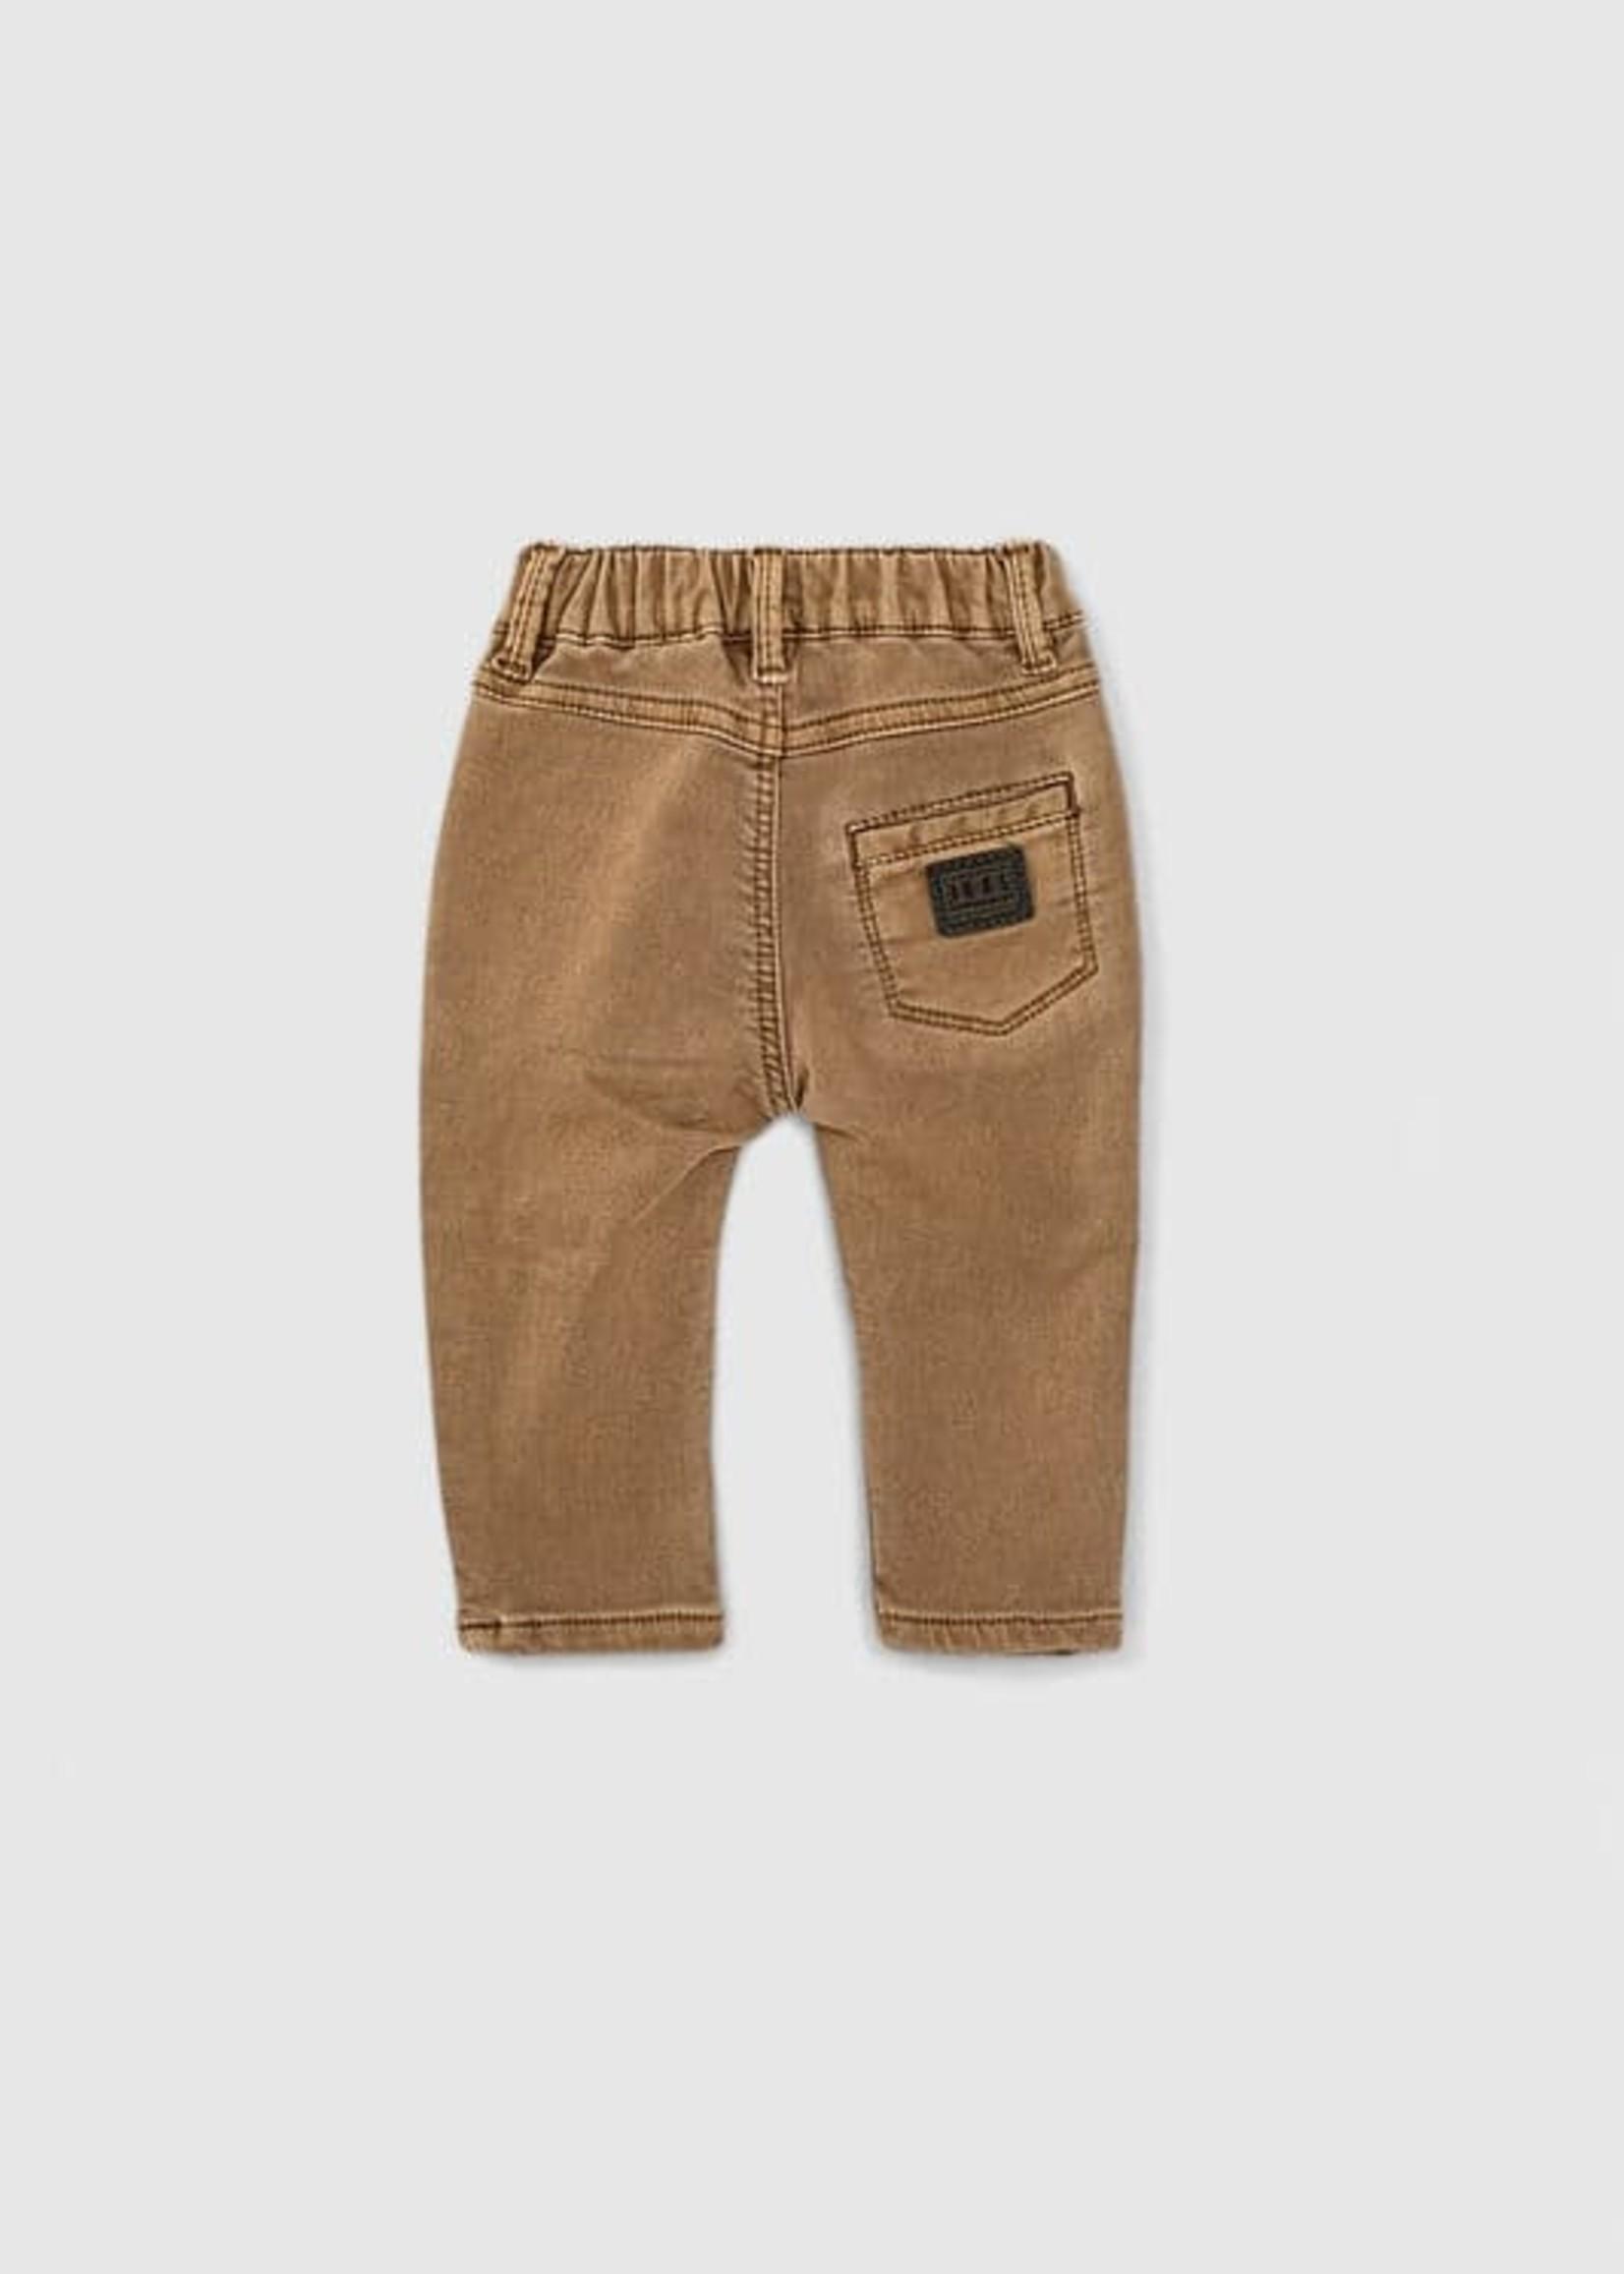 IKKS IKKS viking rock jeans